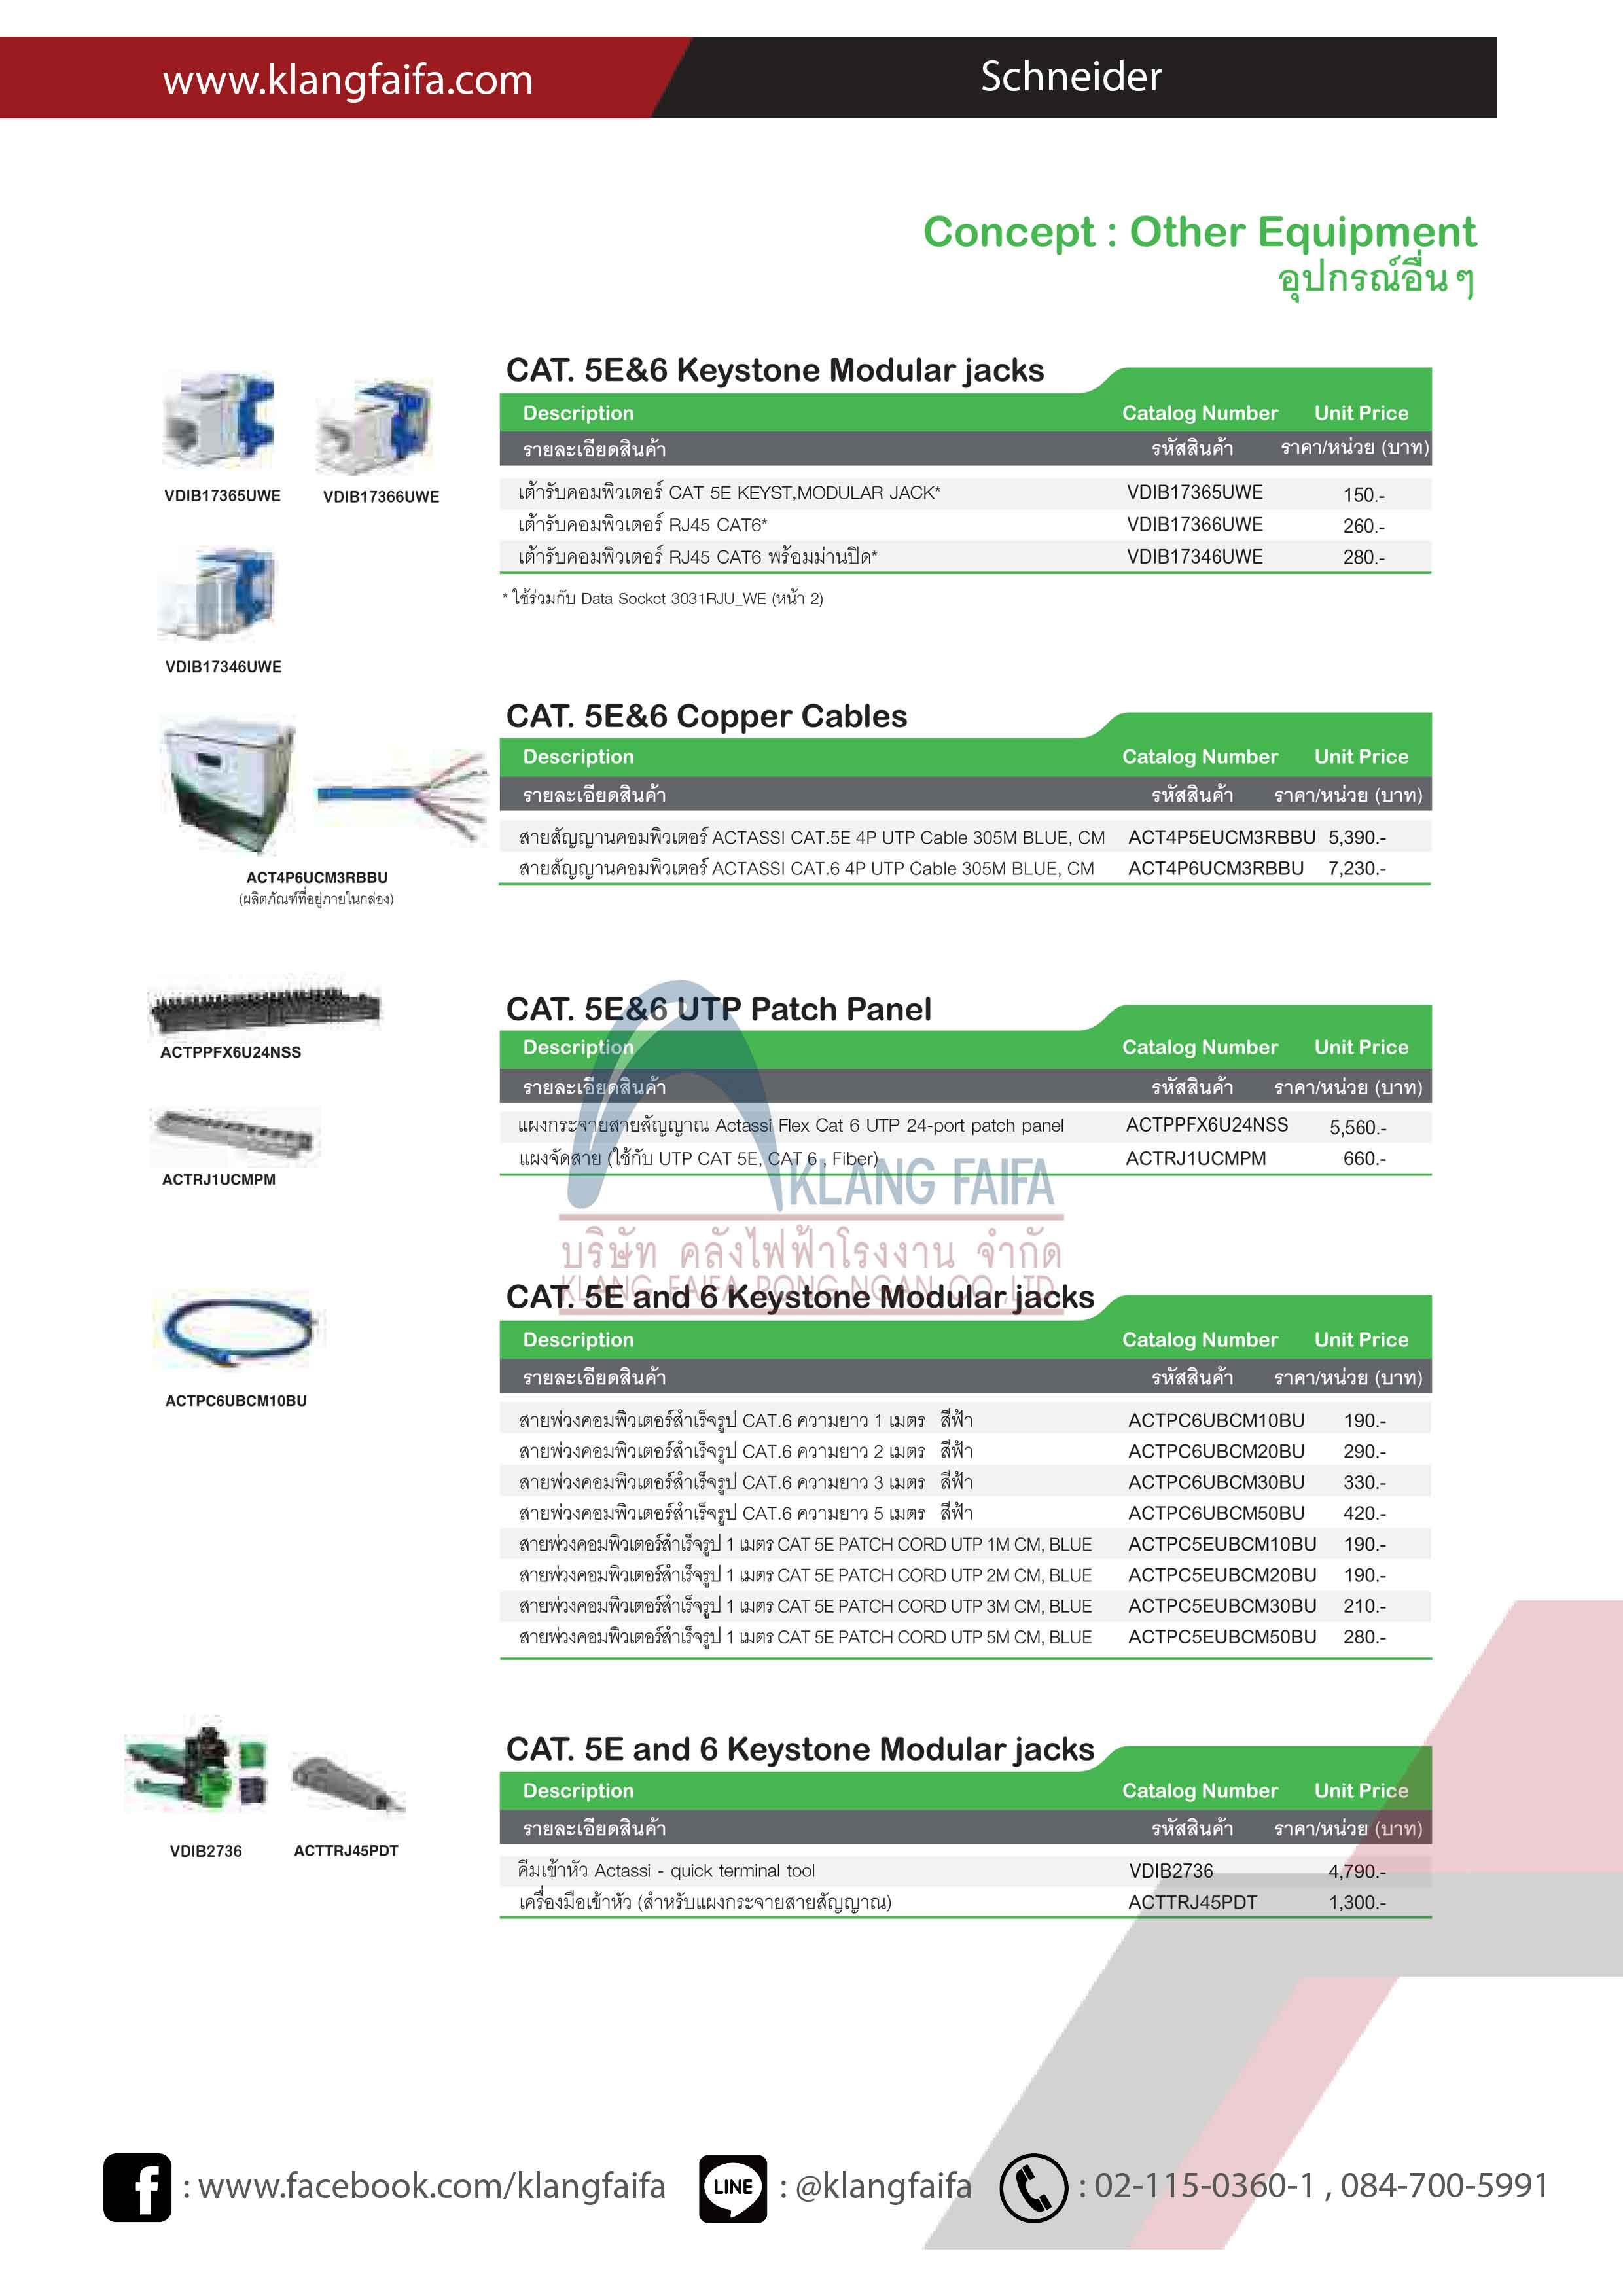 C-Concept, Concept, S-Flexi, Switches, Sockets, Schneider, หน้ากากเต้ารับ, Flush_Plate, FloorSocket, ฝาครอบกันน้ำ, easyclip, Catalog_Schneider_2019